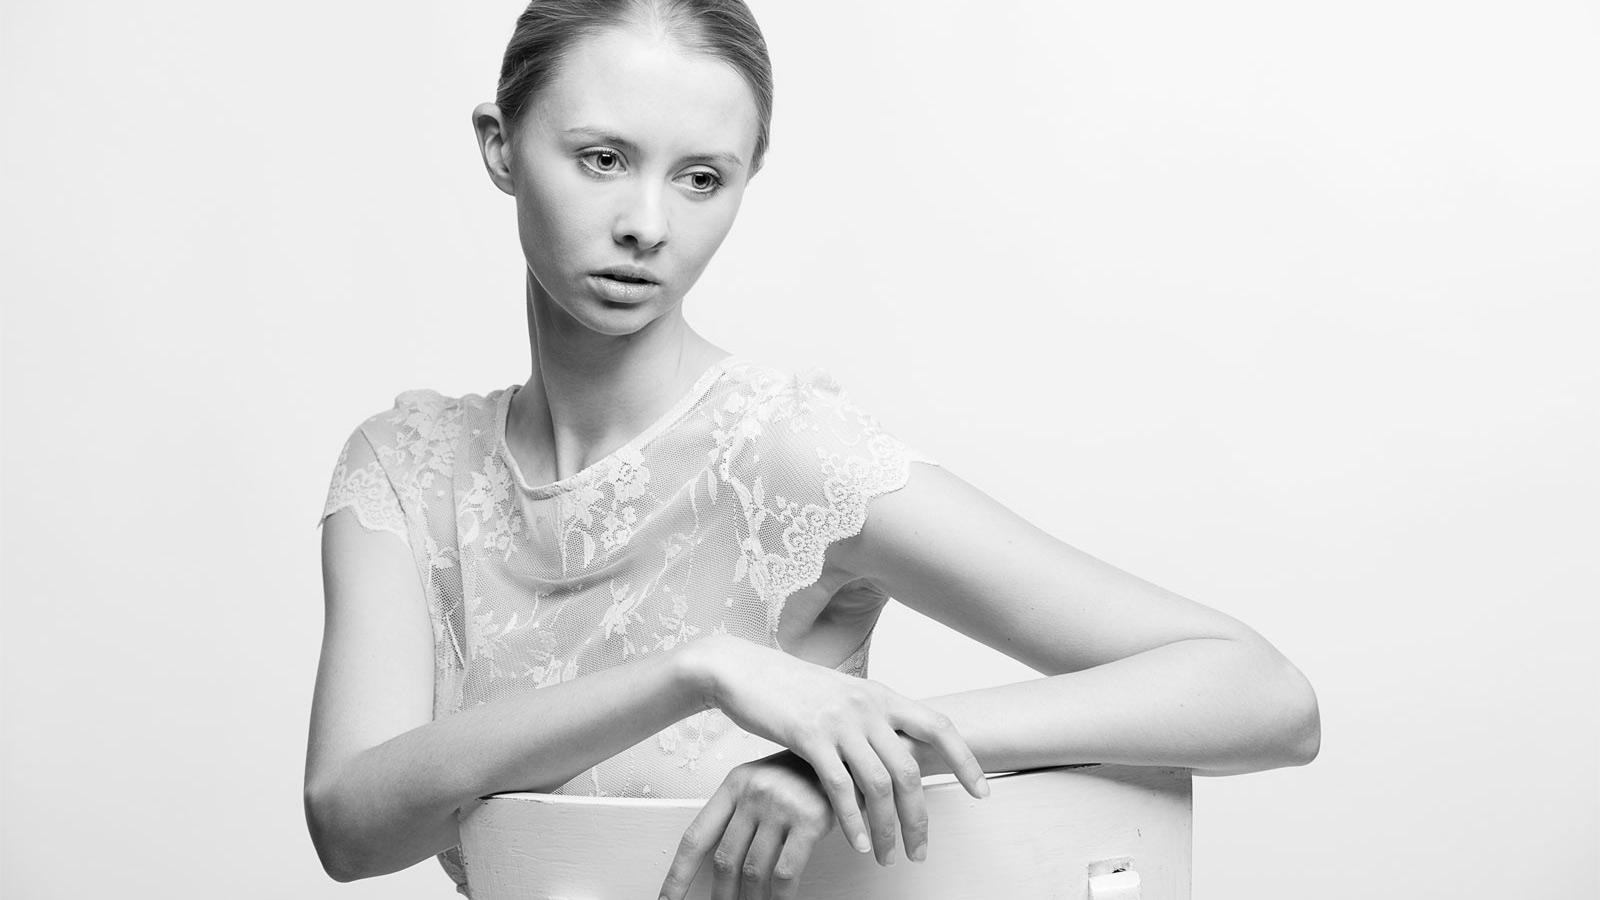 Models im Internet finden